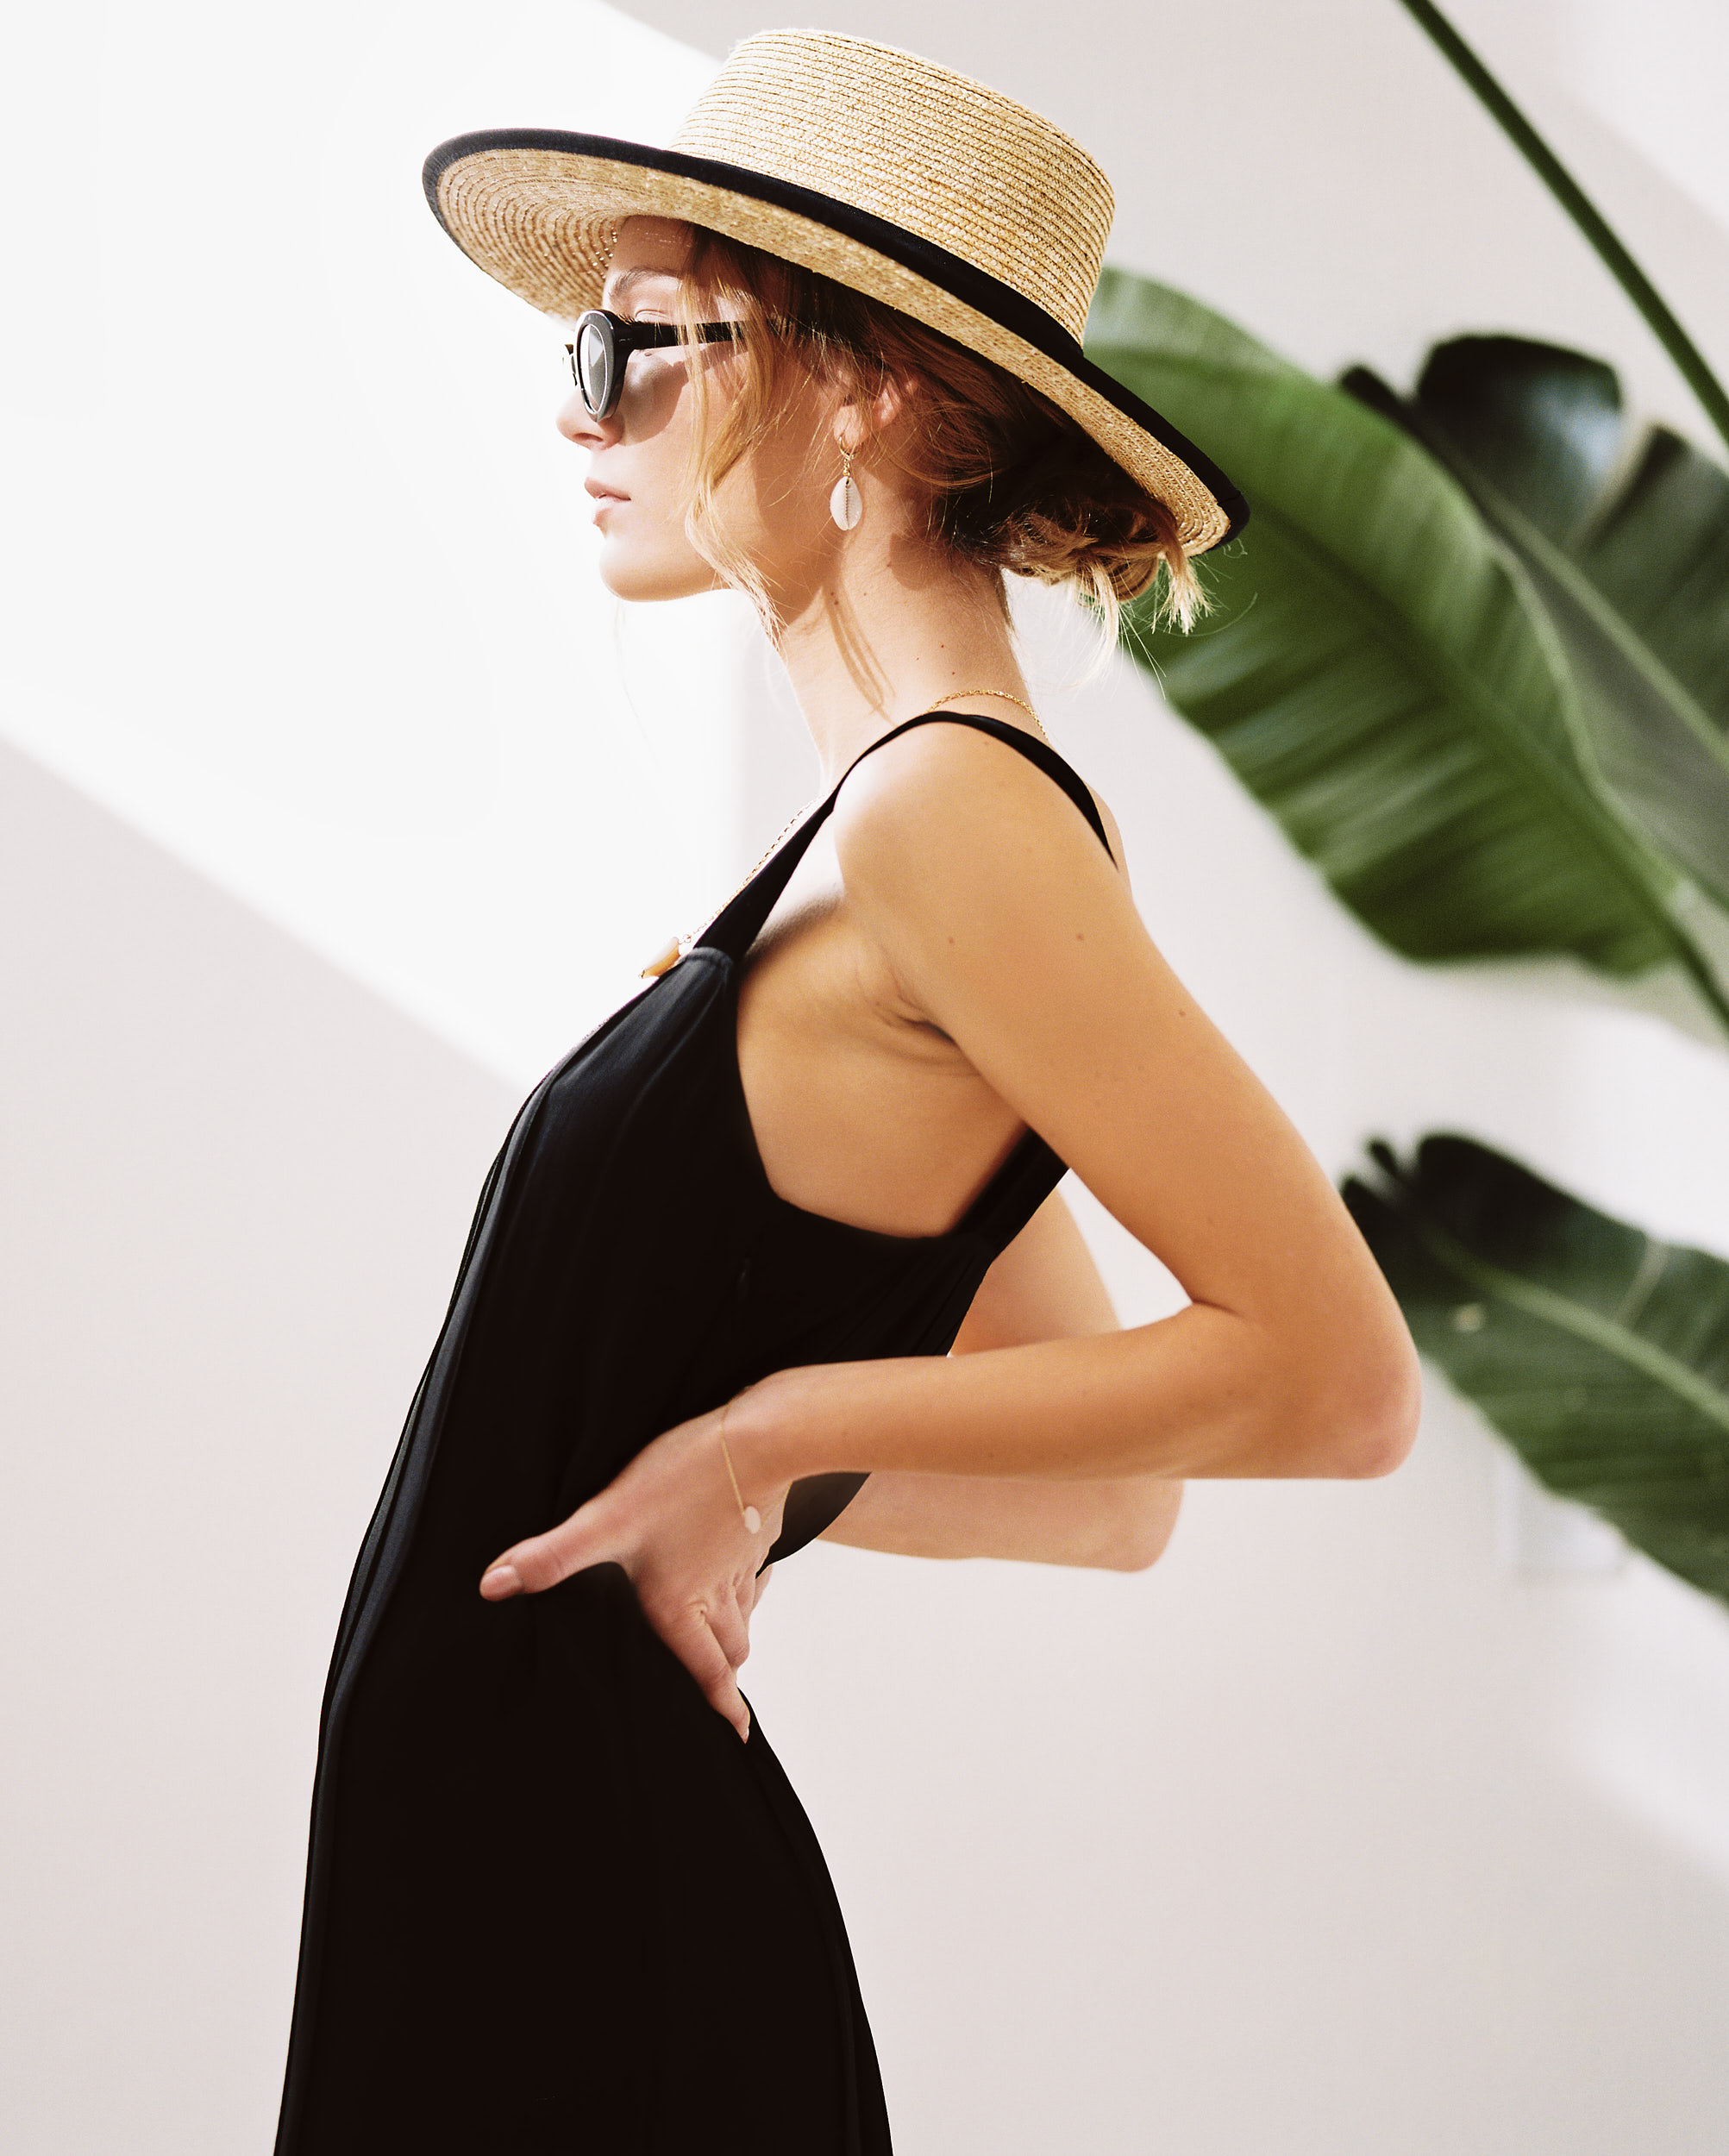 Joe Friend Photography | Fashion Photography | Bazar Boutique Denver Colorado